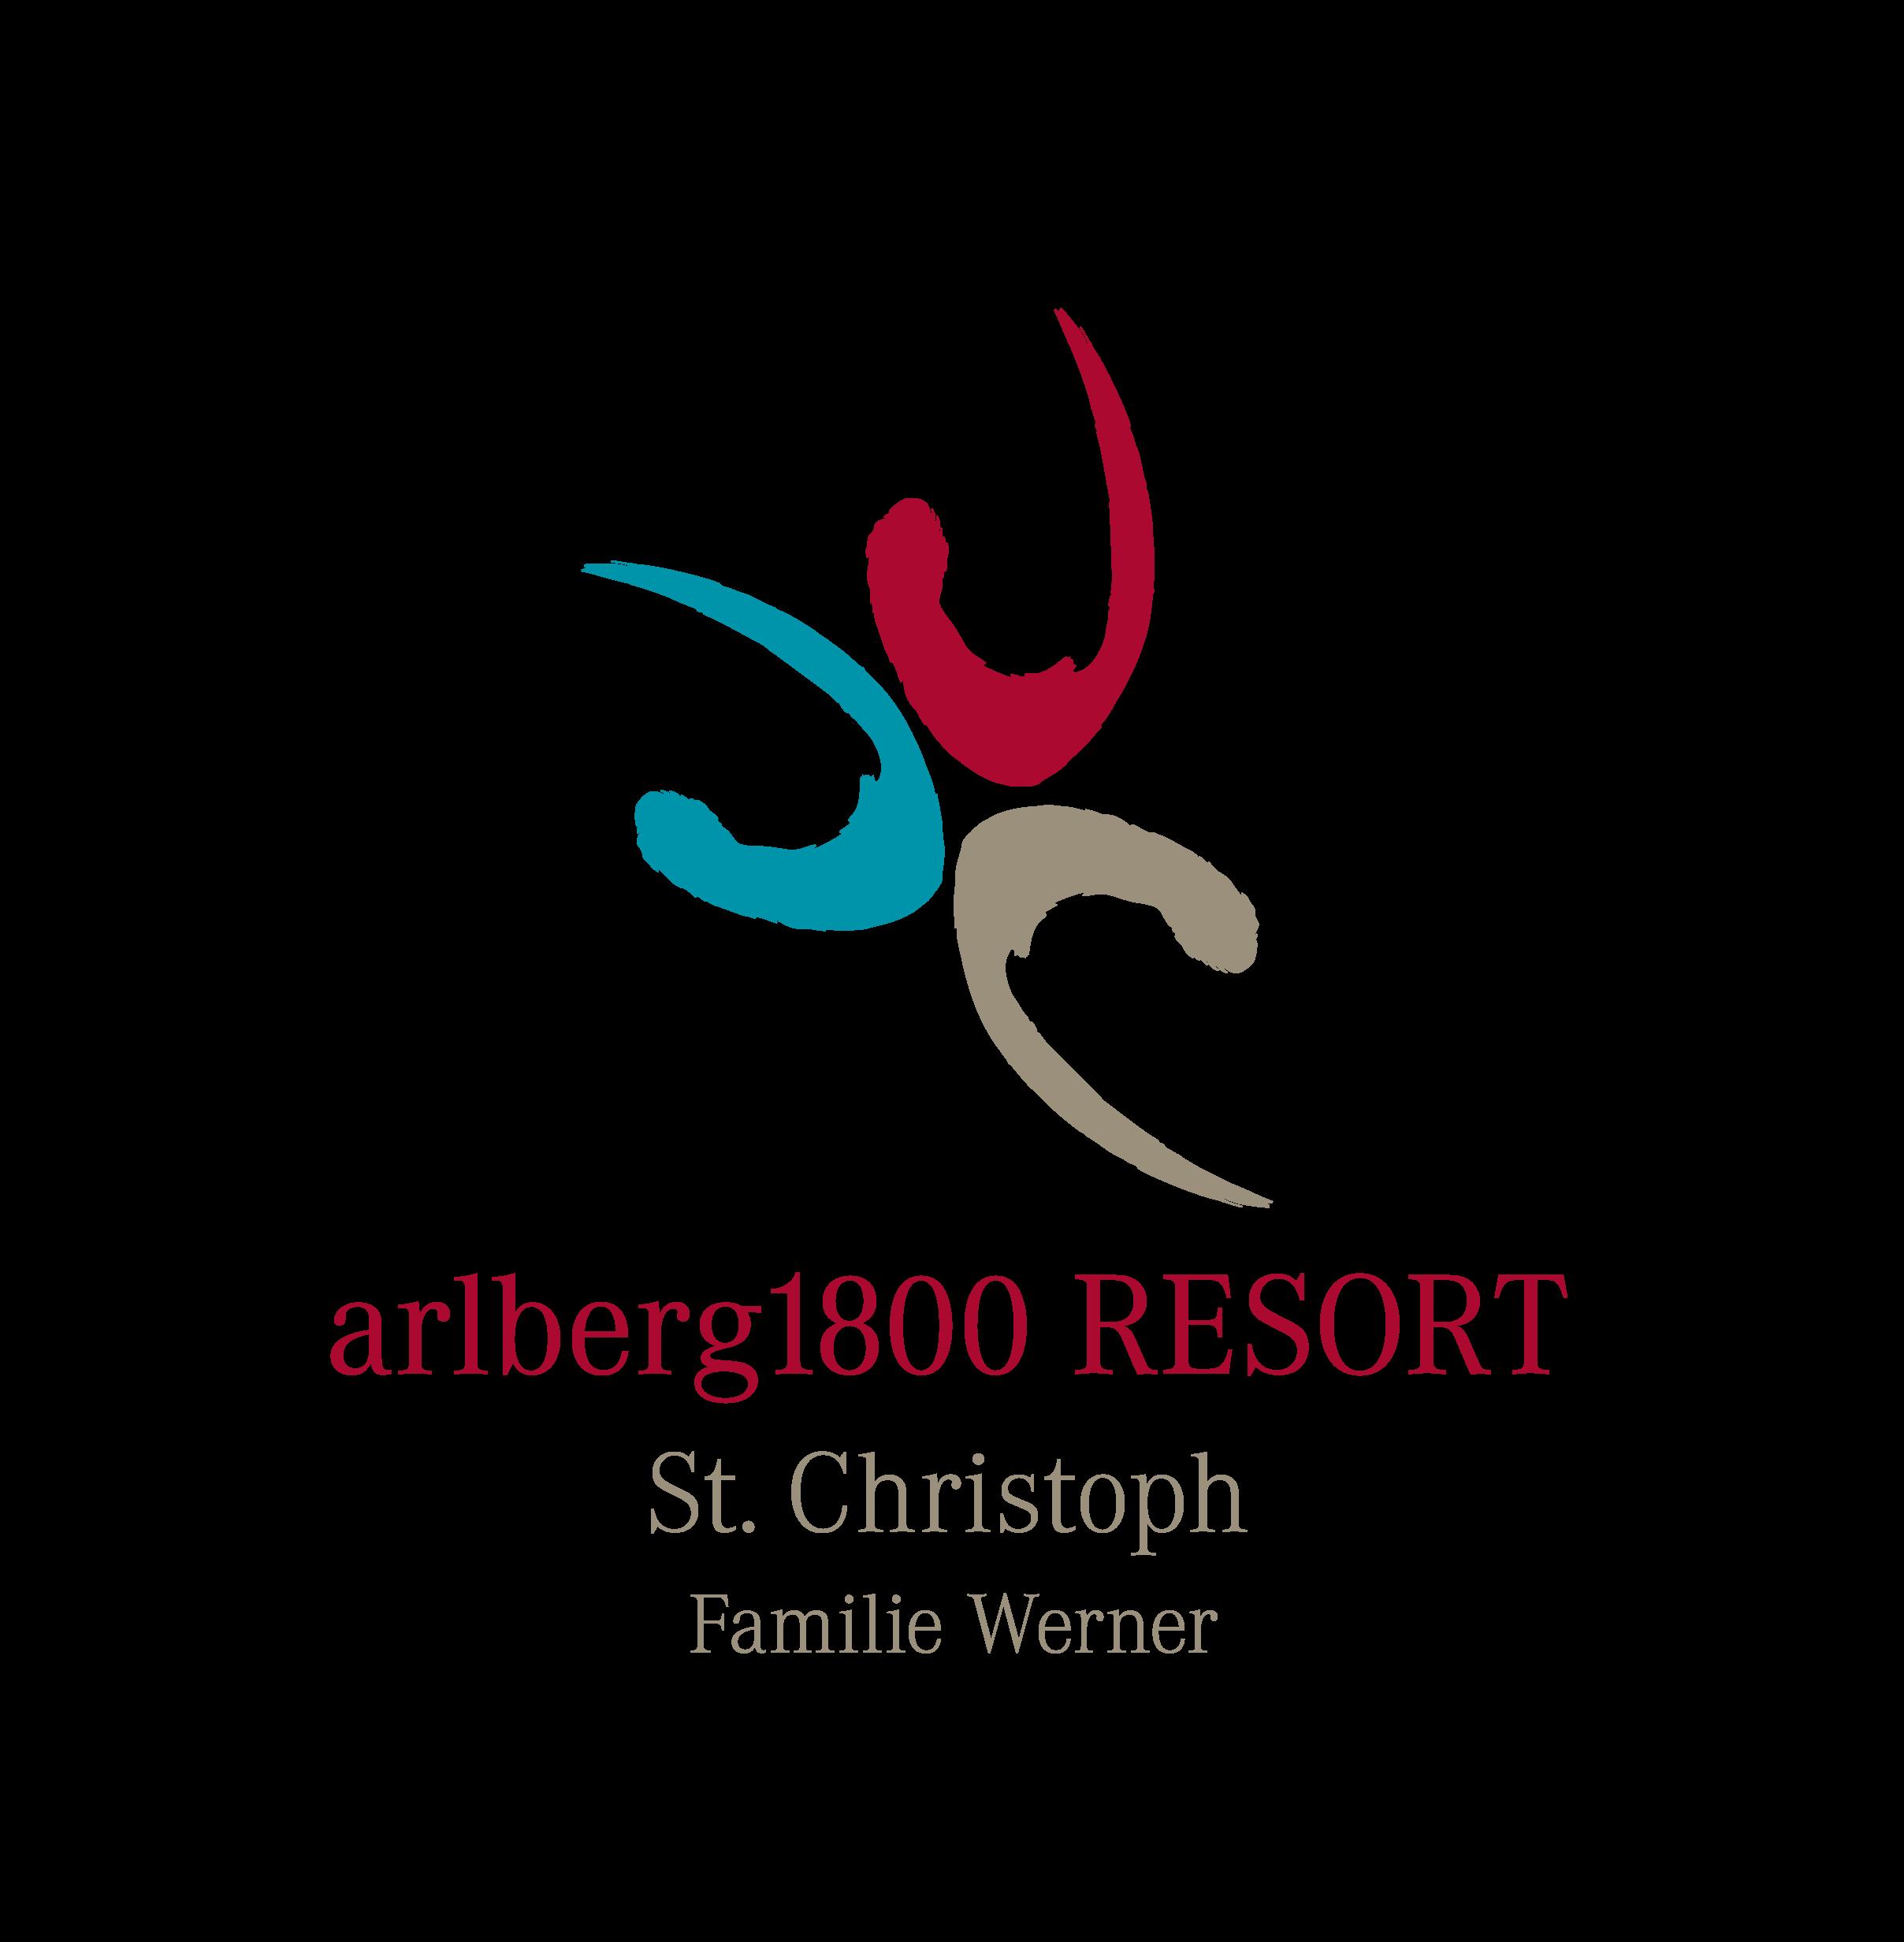 Alberg 1800 Resort Logo